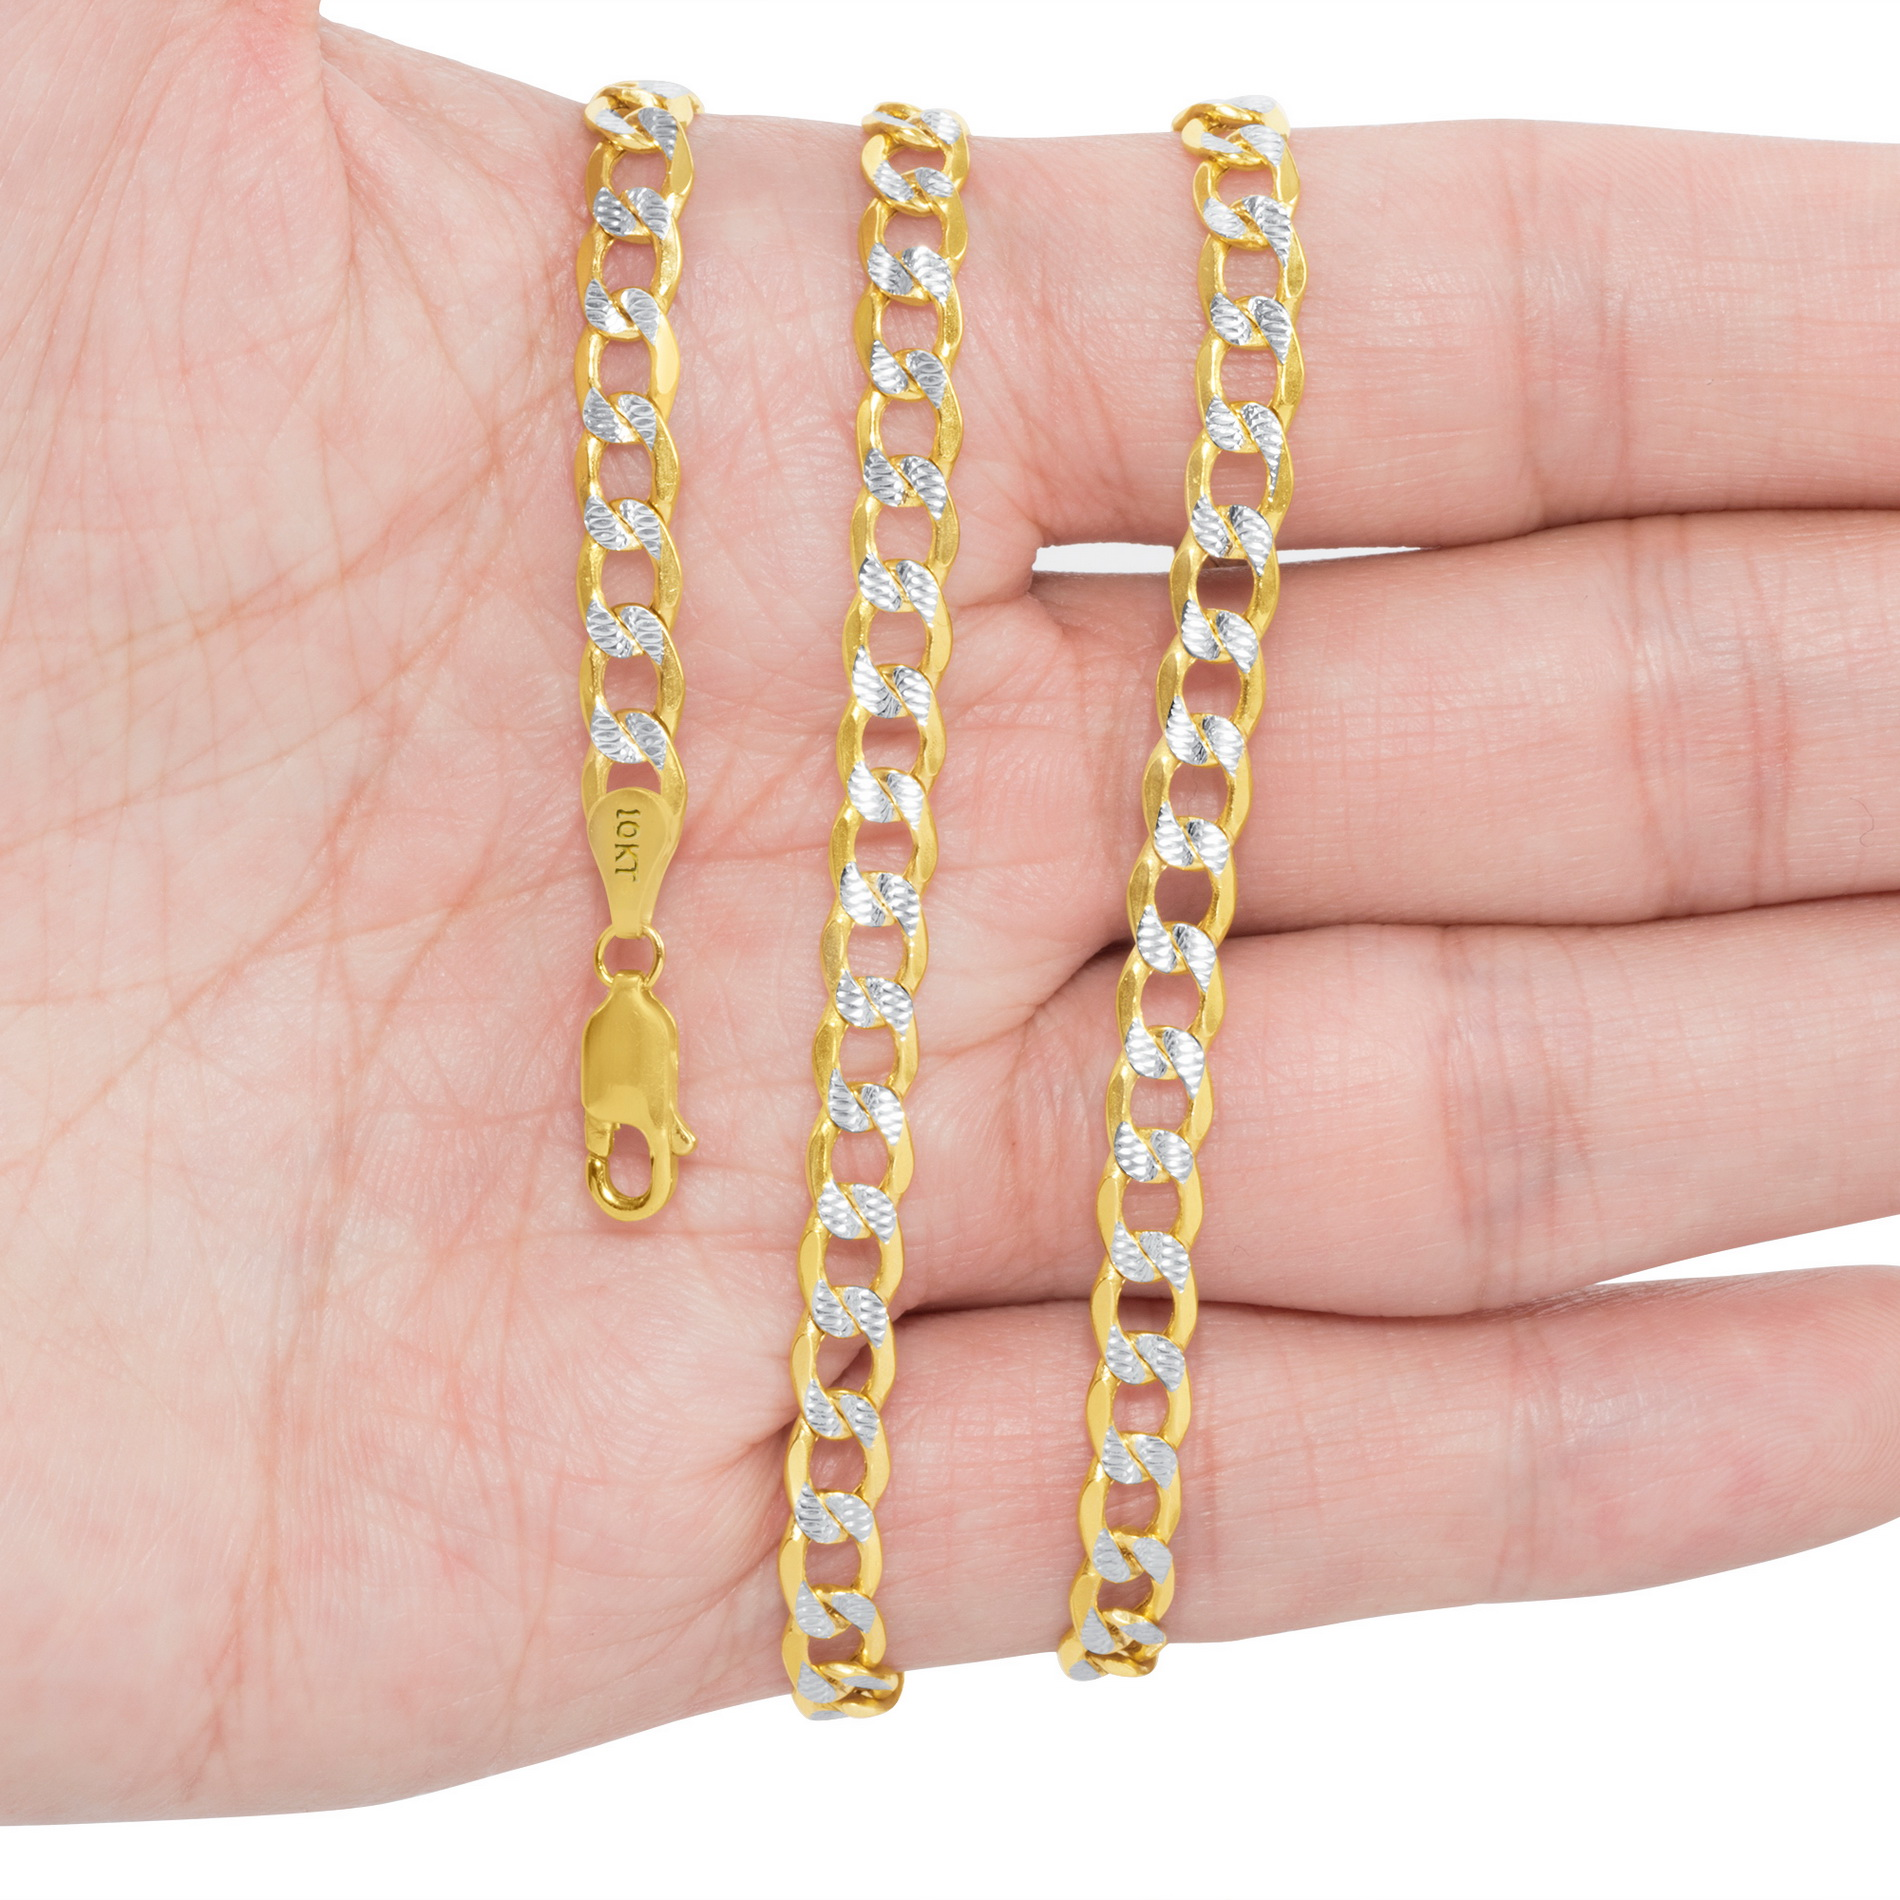 10K-Yellow-Gold-2mm-10-5mm-Diamond-Cut-Pave-Cuban-Chain-Necklace-Bracelet-7-034-30-034 thumbnail 21